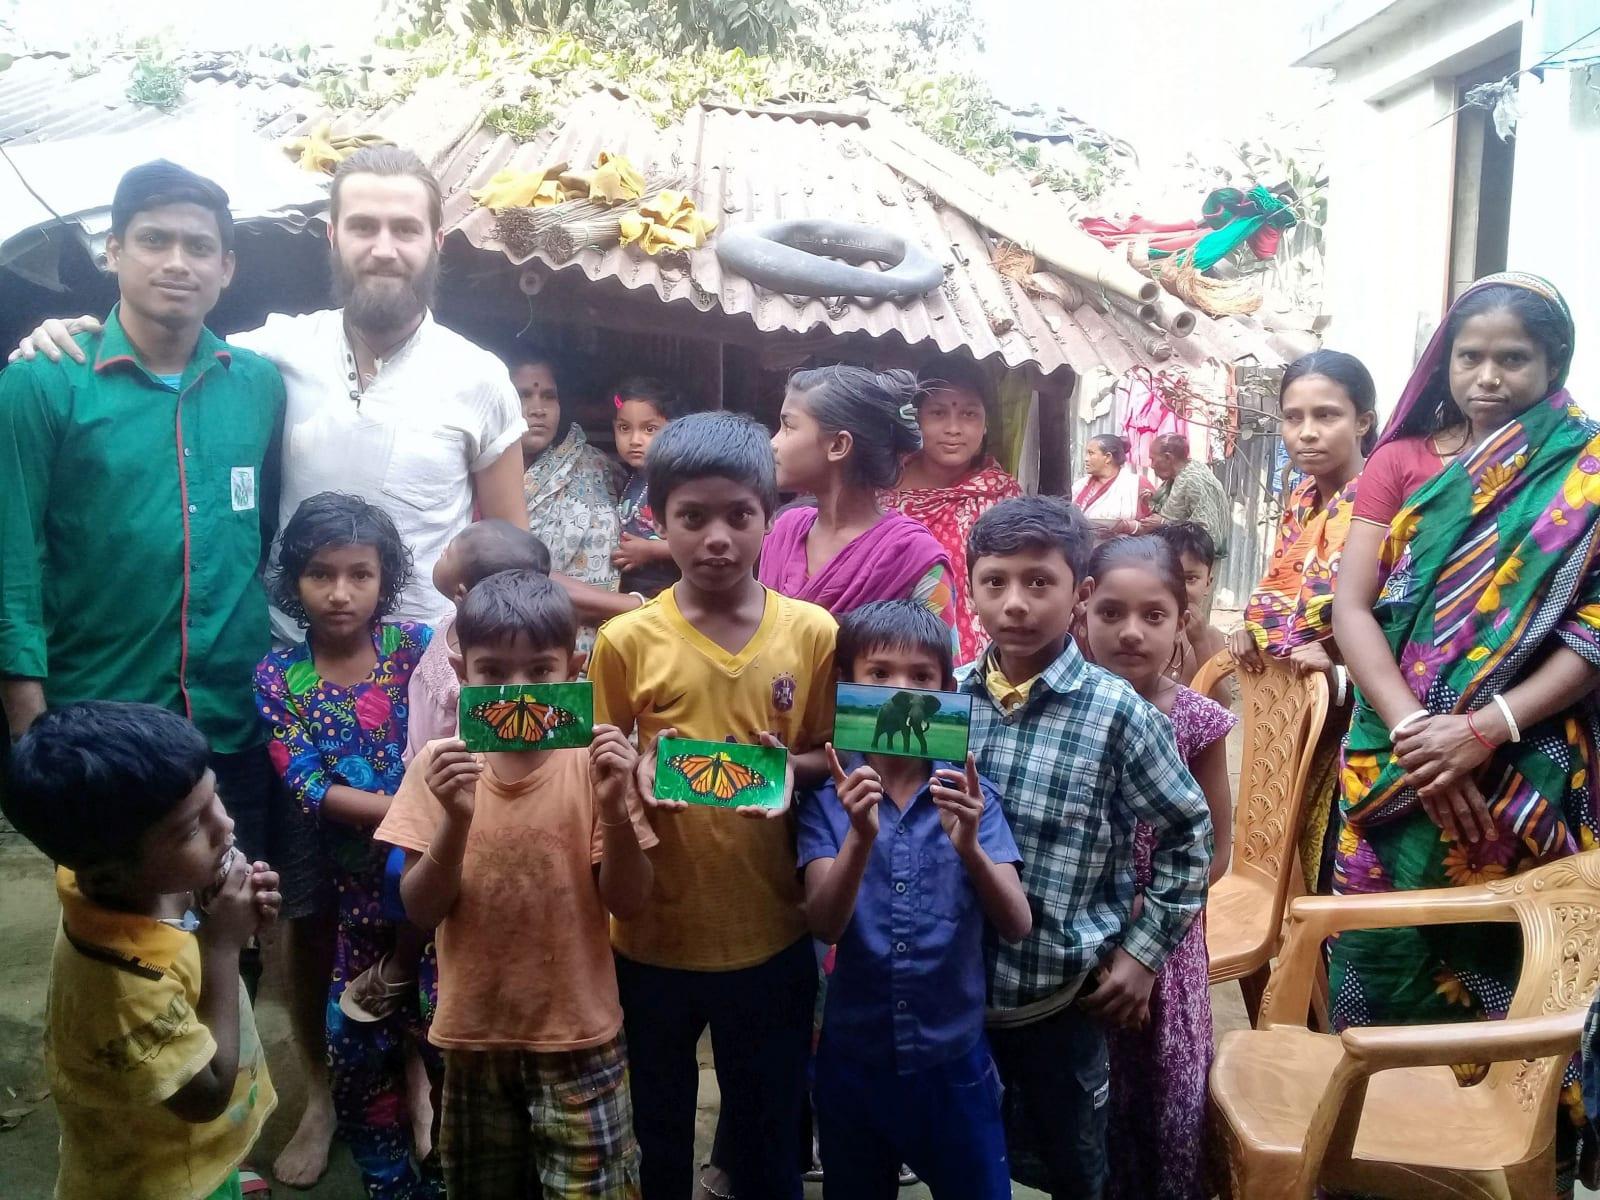 Foto z hinduistického slumu, Bangladéš